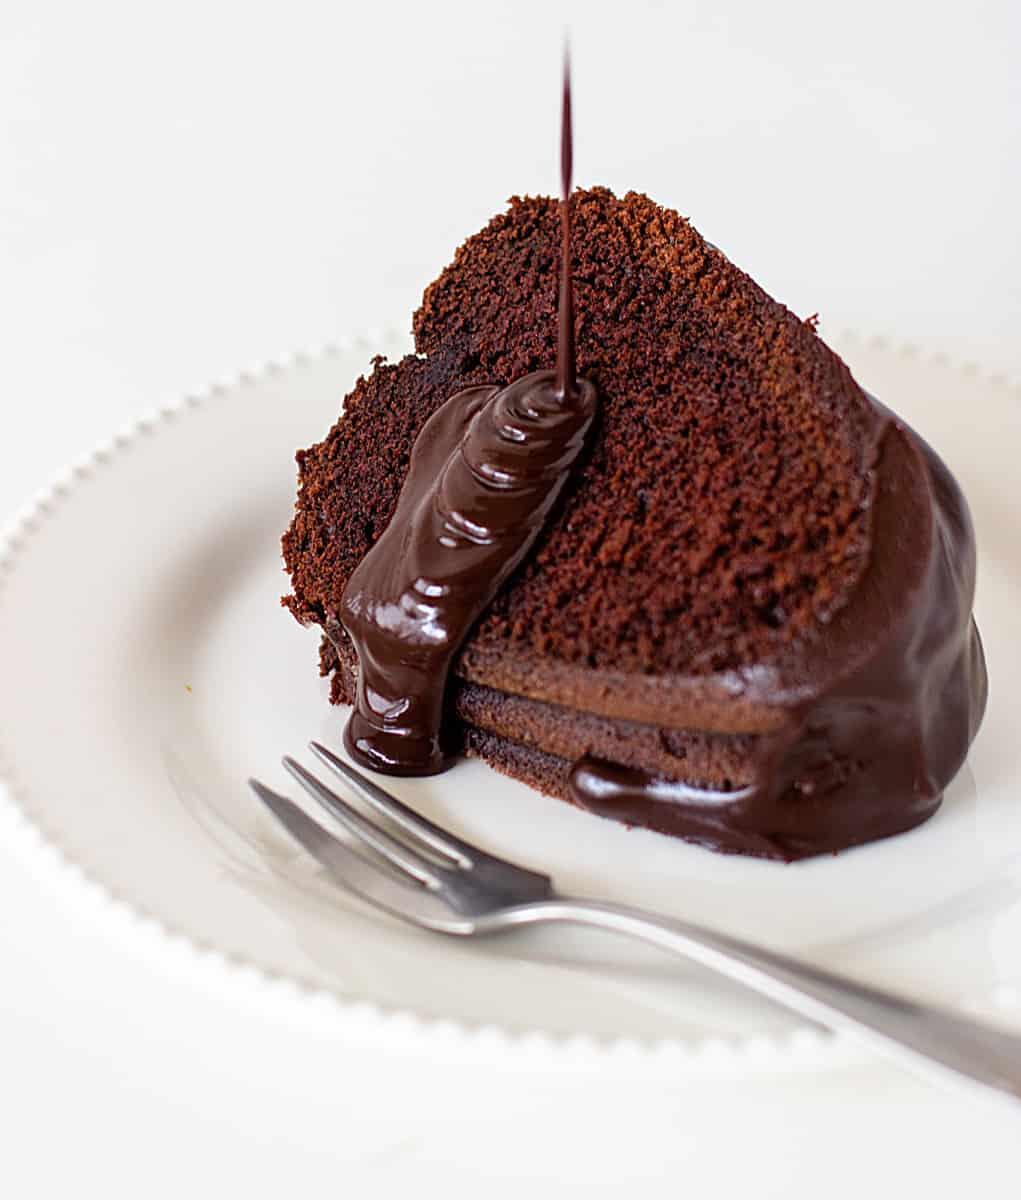 Slice of chocolate bundt cake on white plate, glaze pouring